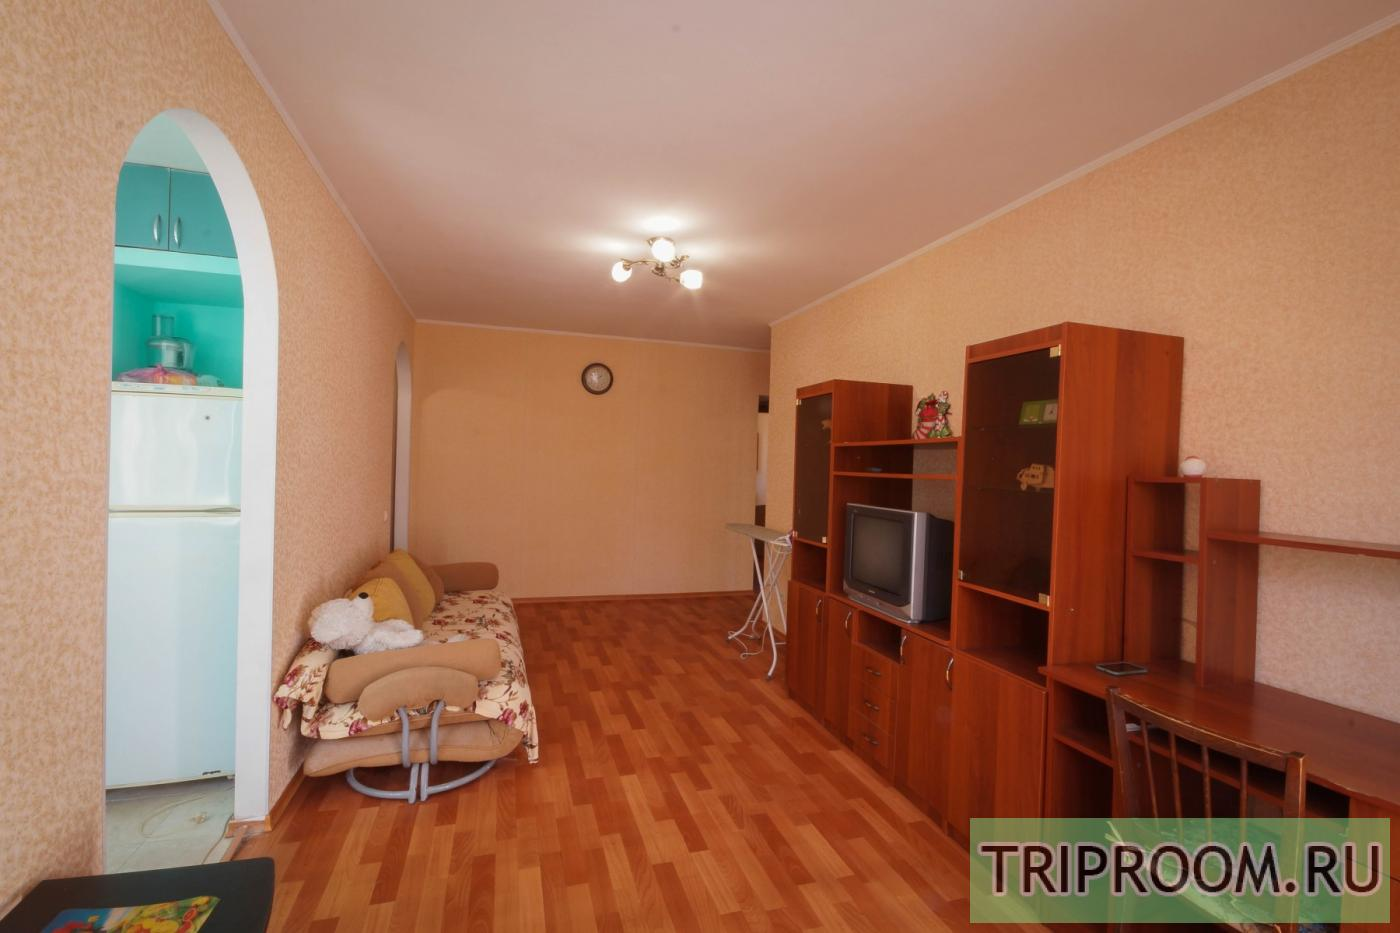 3-комнатная квартира посуточно (вариант № 19470), ул. Спера улица, фото № 4